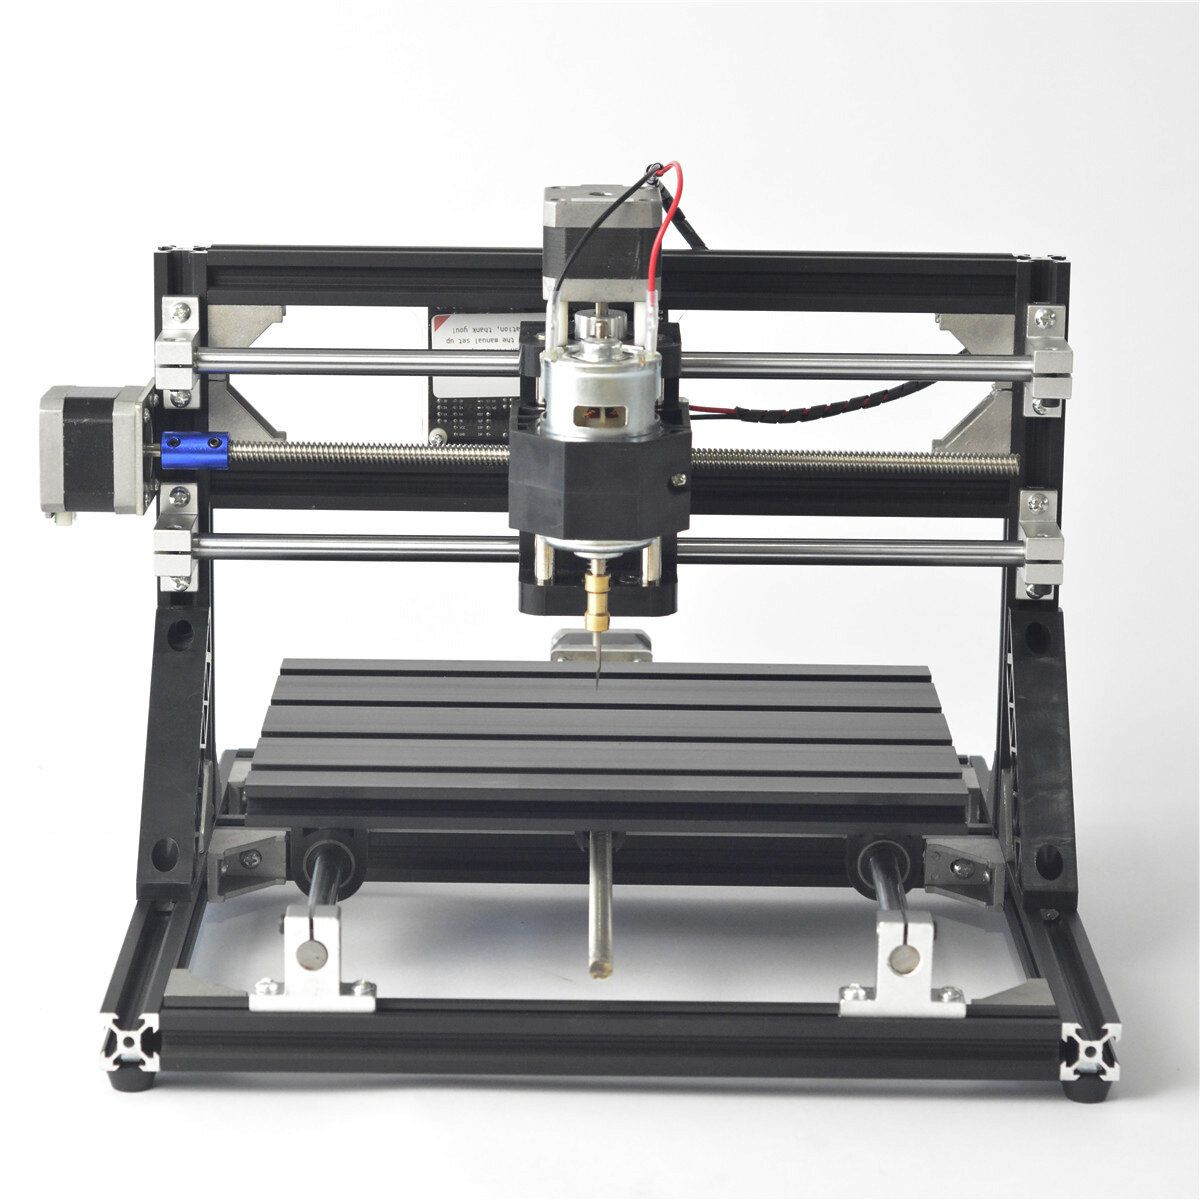 EZC US$232.30 500mW CNC3018 Laser Engraving Machine for Plastic Wood Acrylic PVC PCB